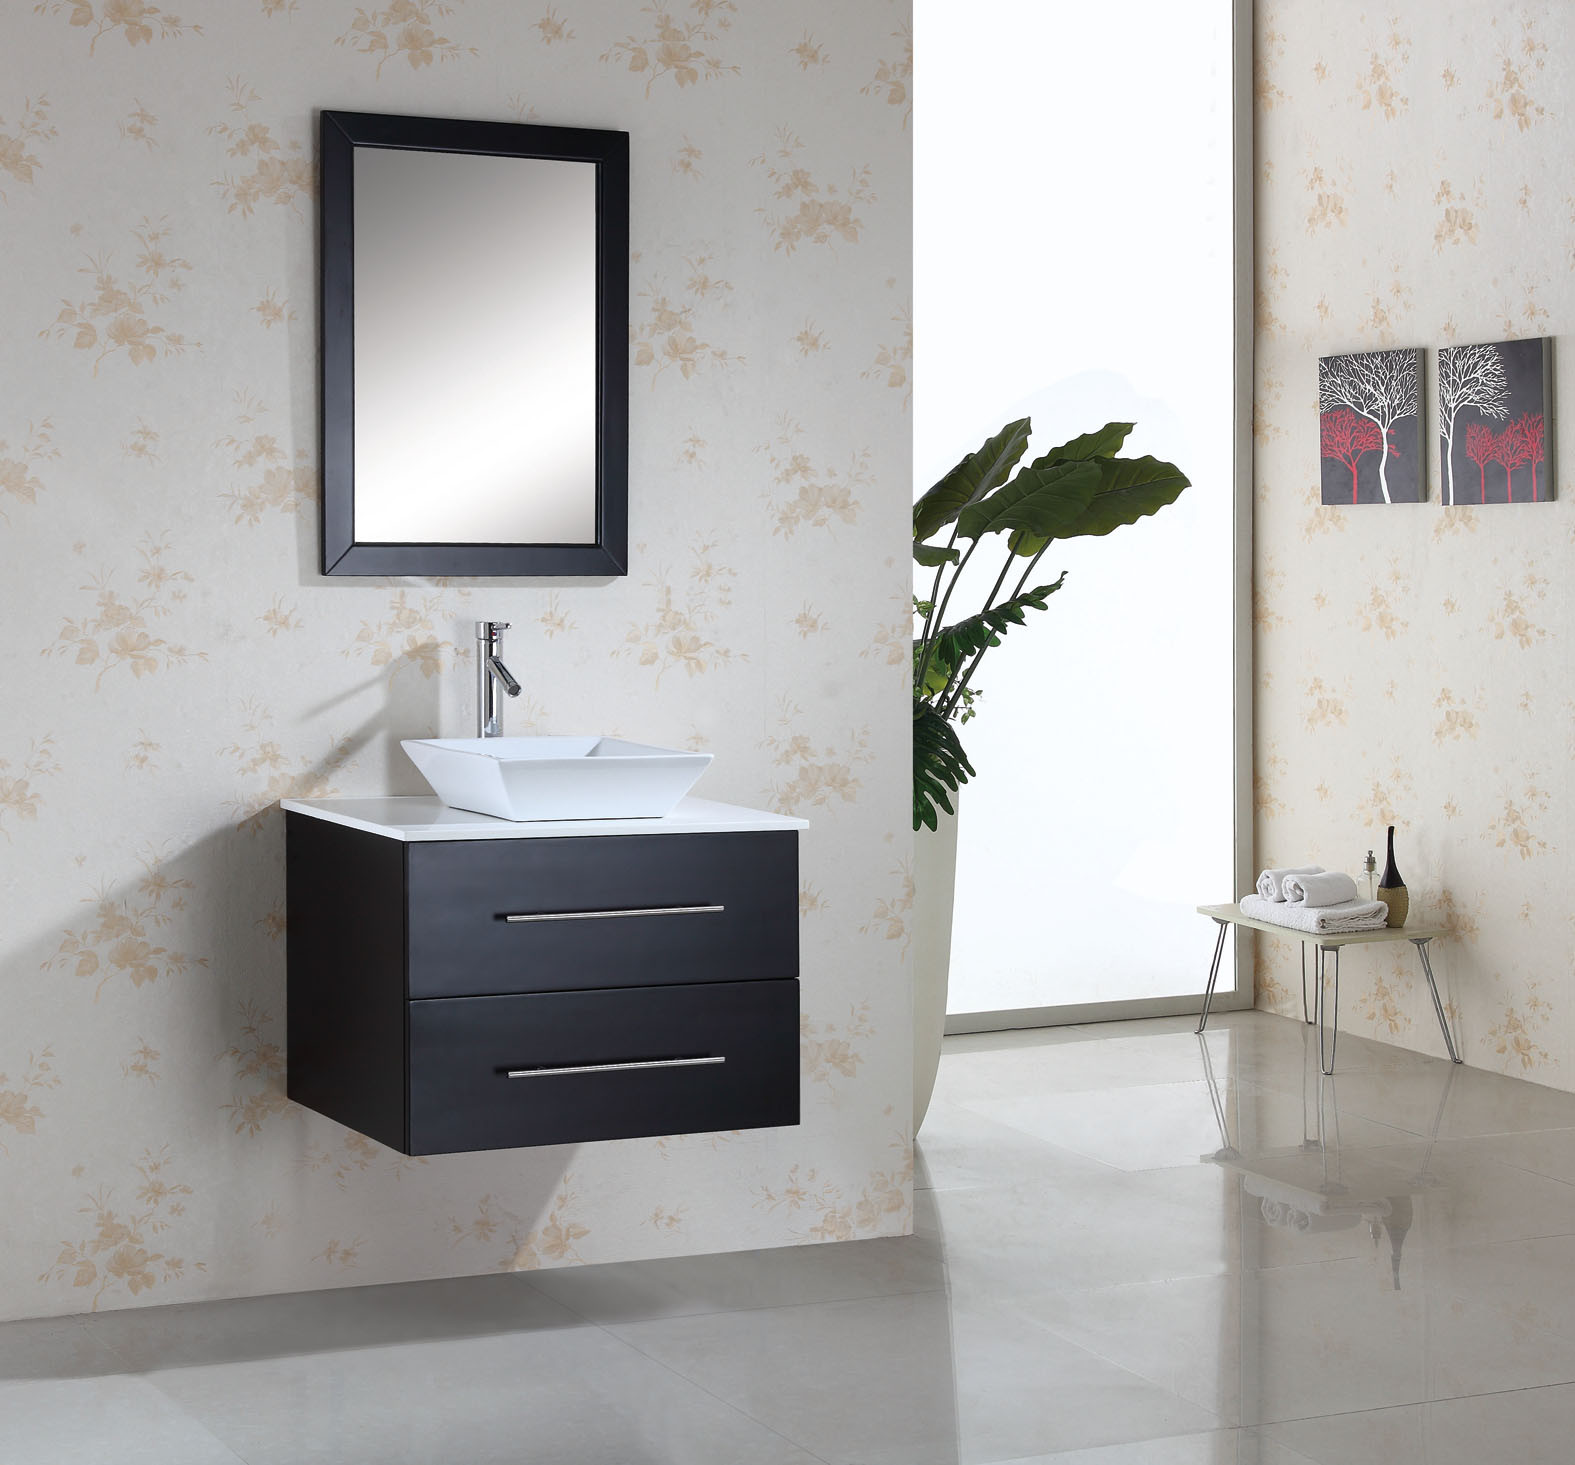 Virtu Usa Marsala Single 29 5 Inch Modern Wall Mount Bathroom Vanity Set Espresso